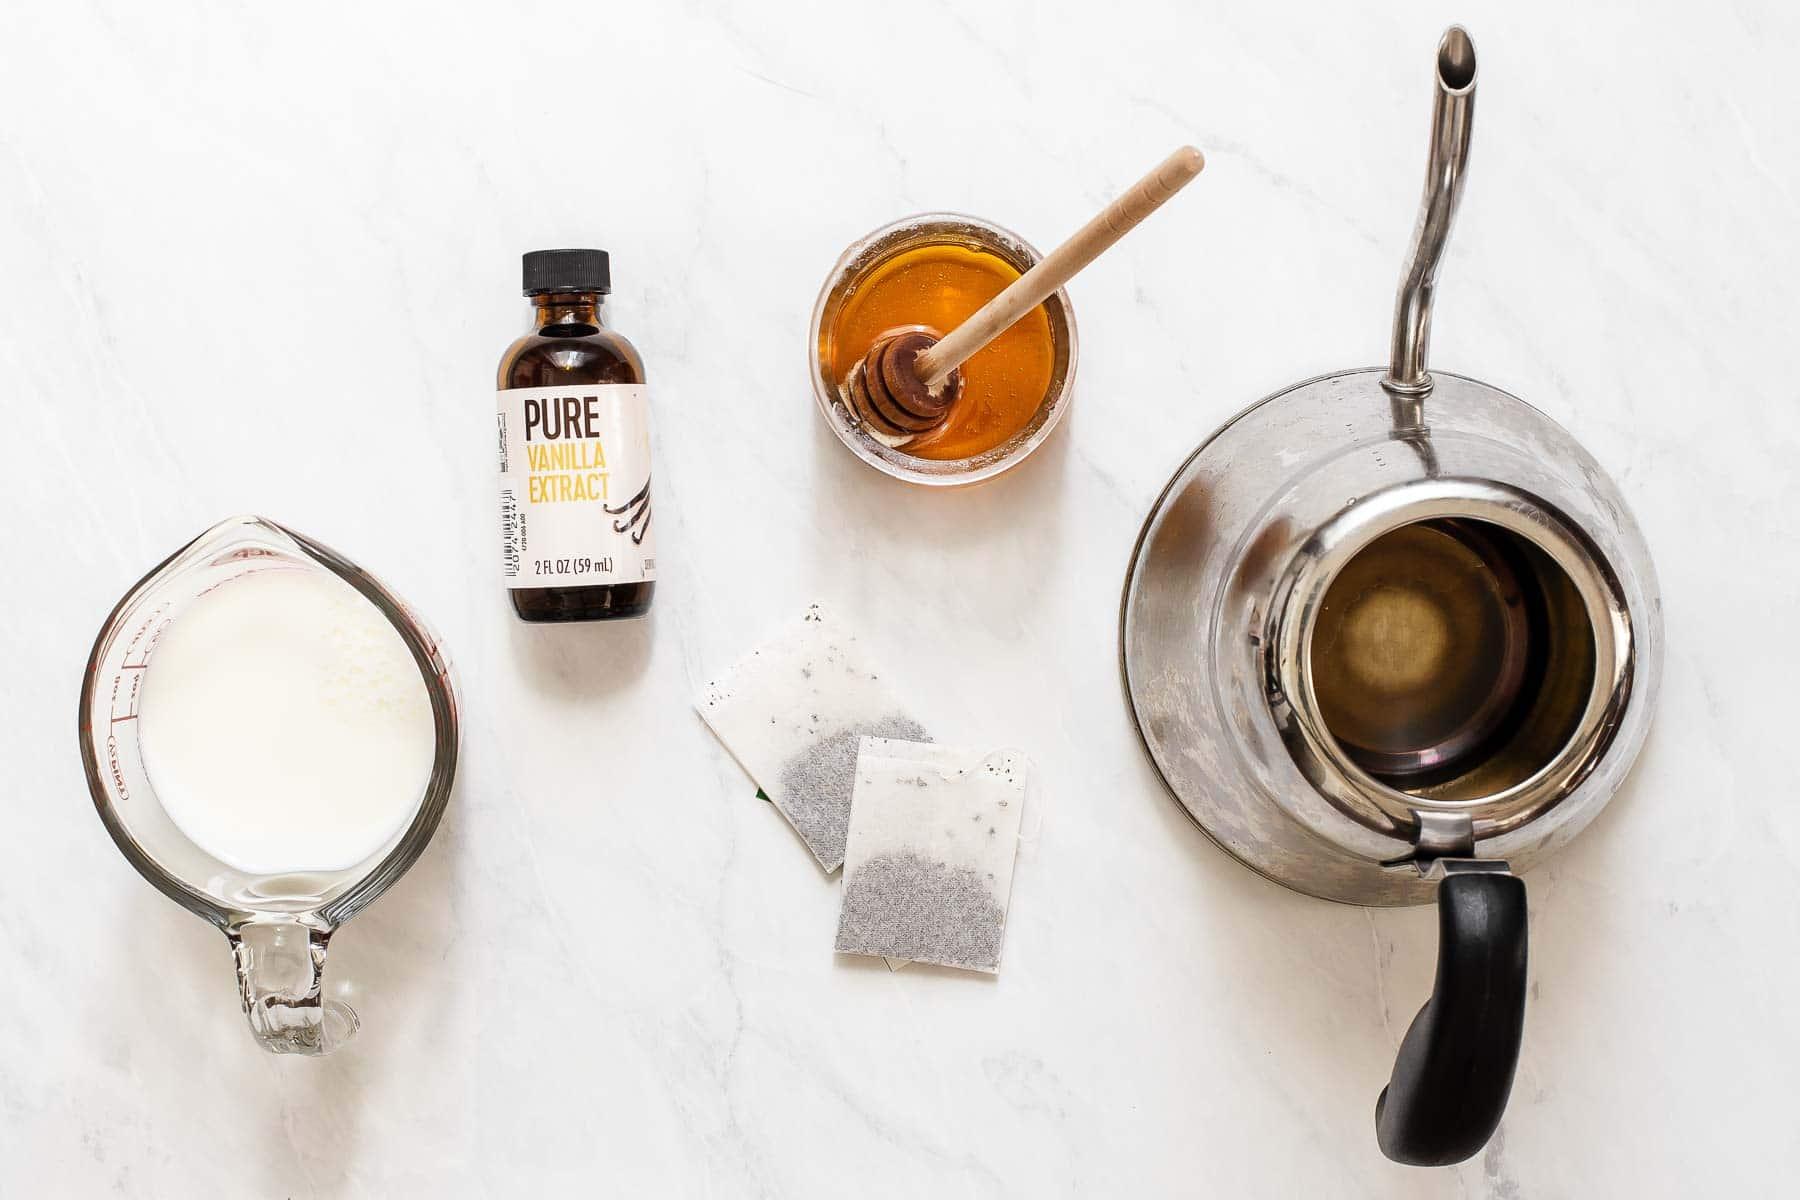 Ingredients for a London fog earl grey latte.